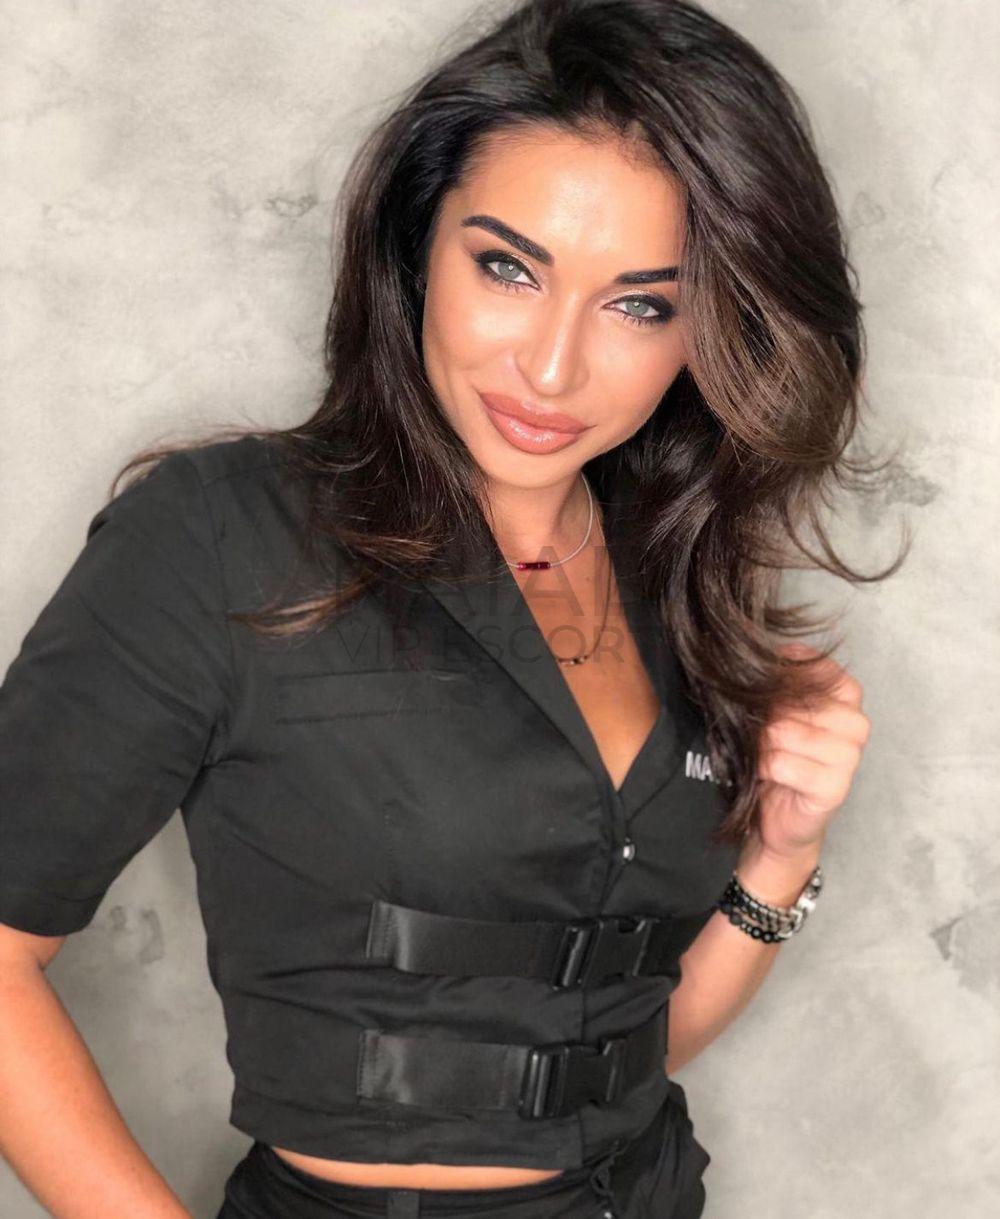 Photo of Suri on Naiad vip escort service in Paris